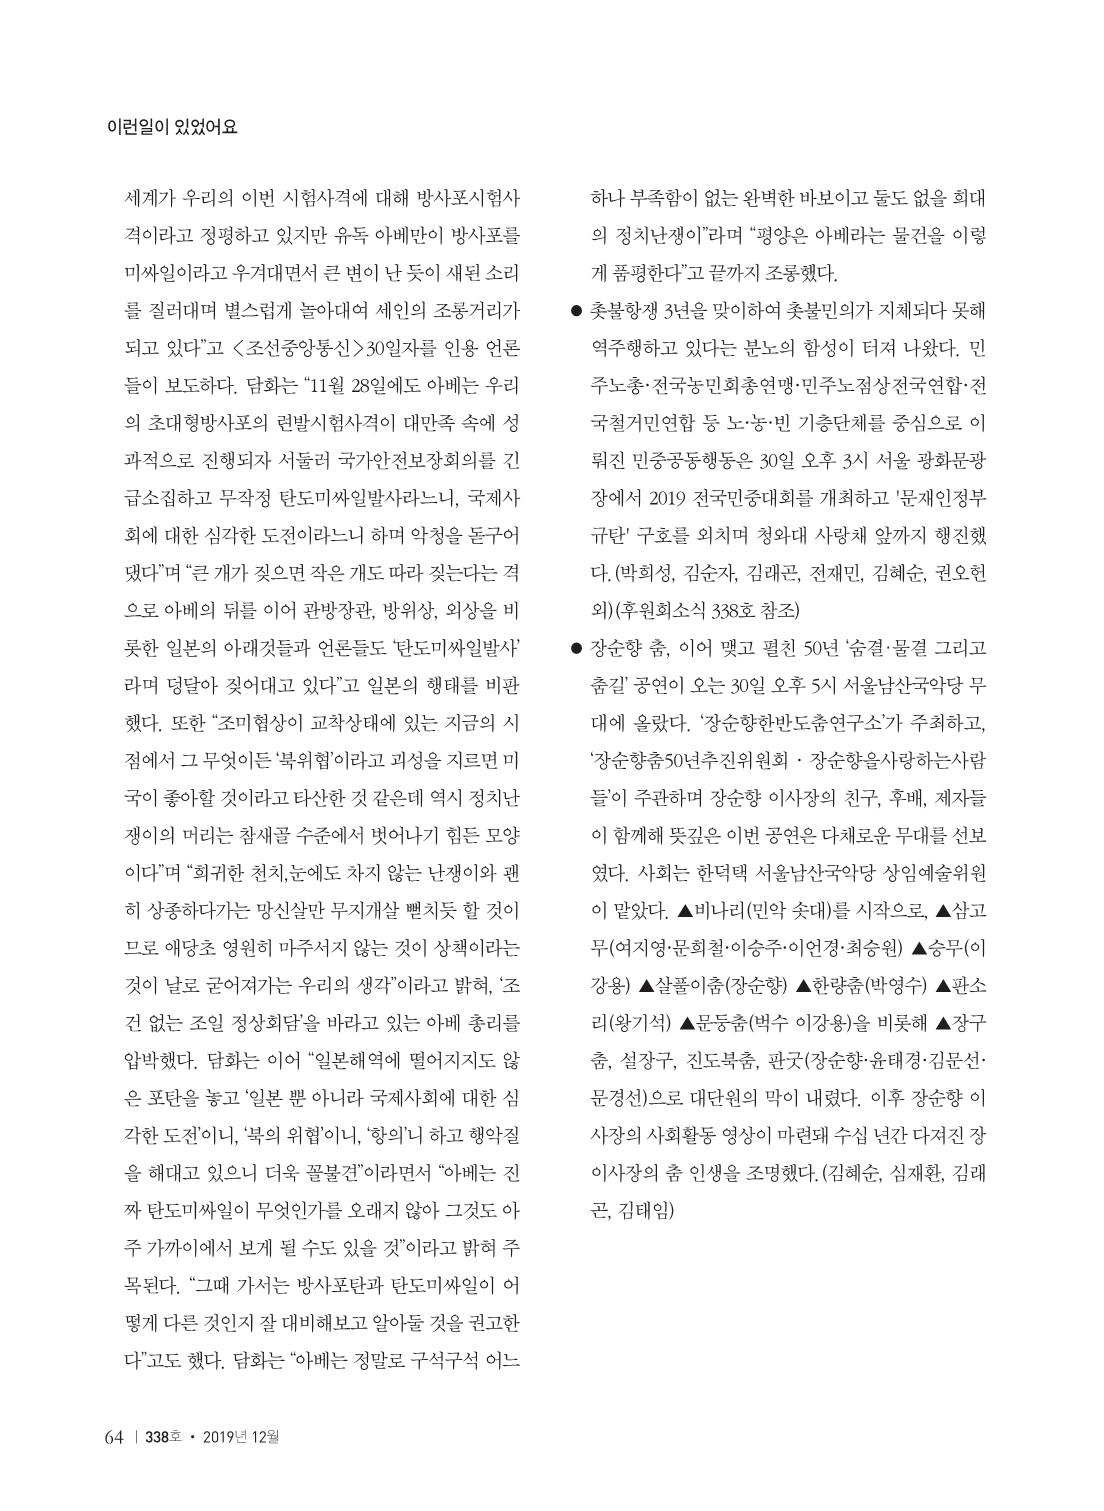 5802db1f-6a90-451c-ac2e-da2a23bee939.pdf-0066.jpg